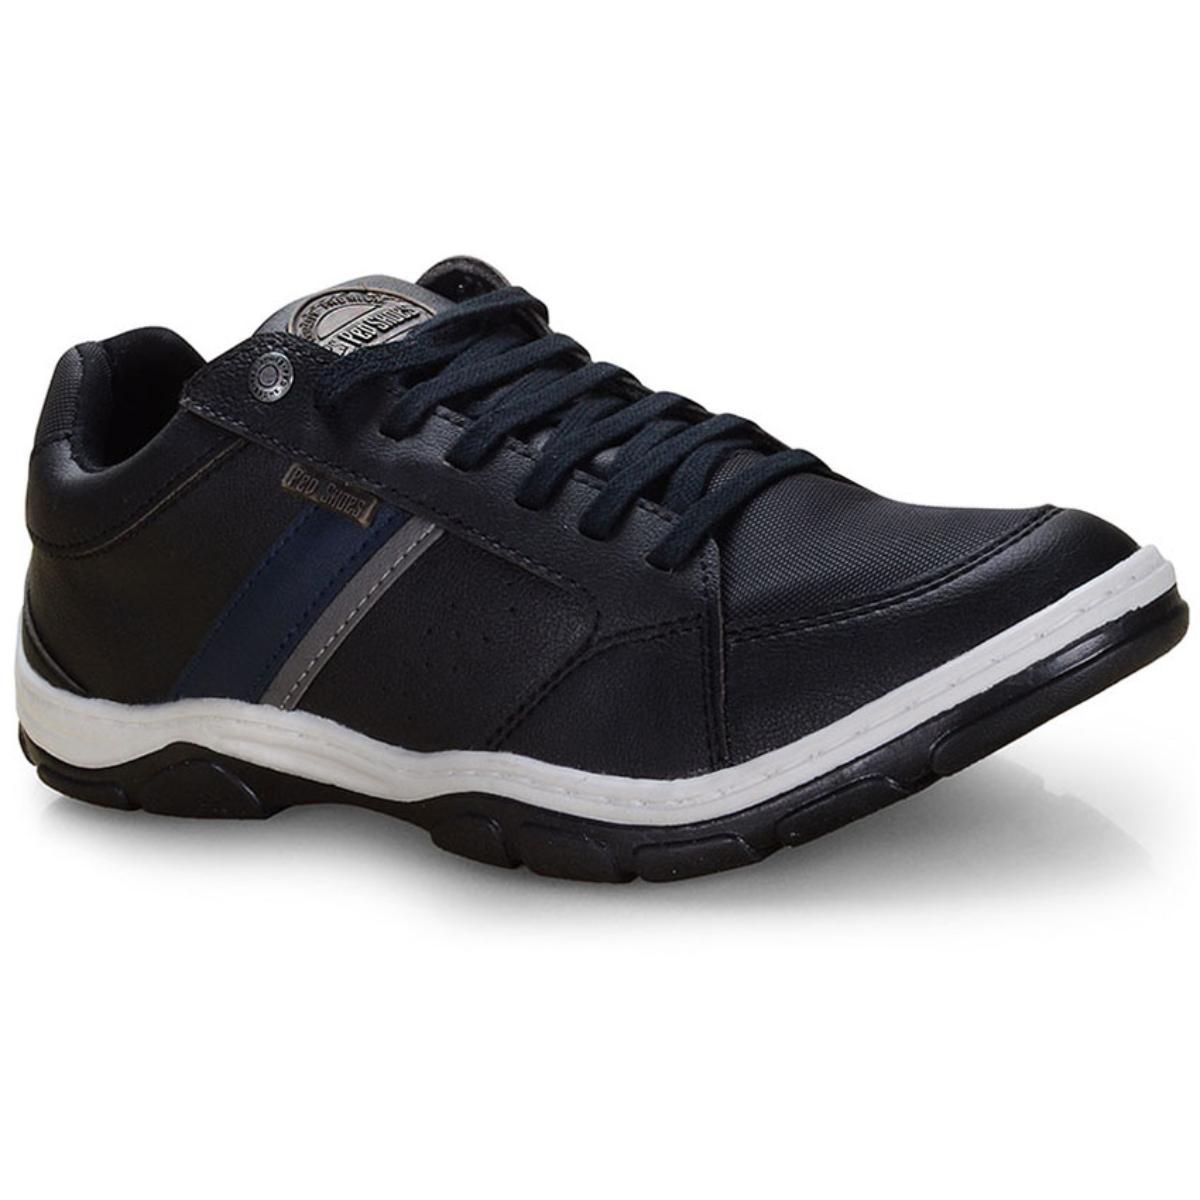 Sapatênis Masculino Ped Shoes 17502-a Preto Kit c/ Relogio